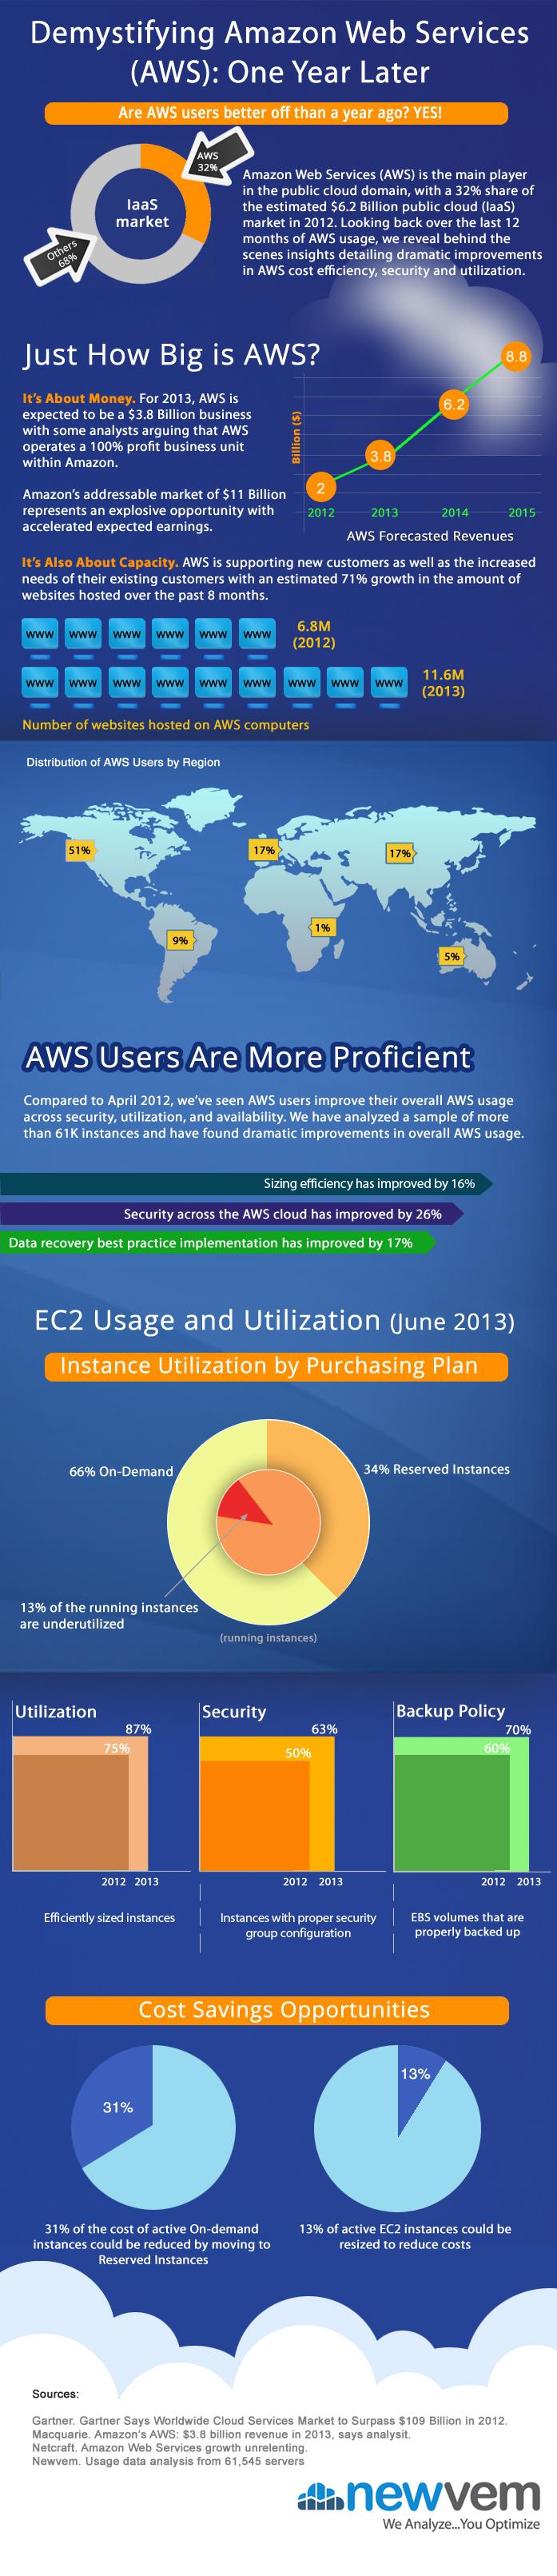 8. Demystifying Amazon Web Services